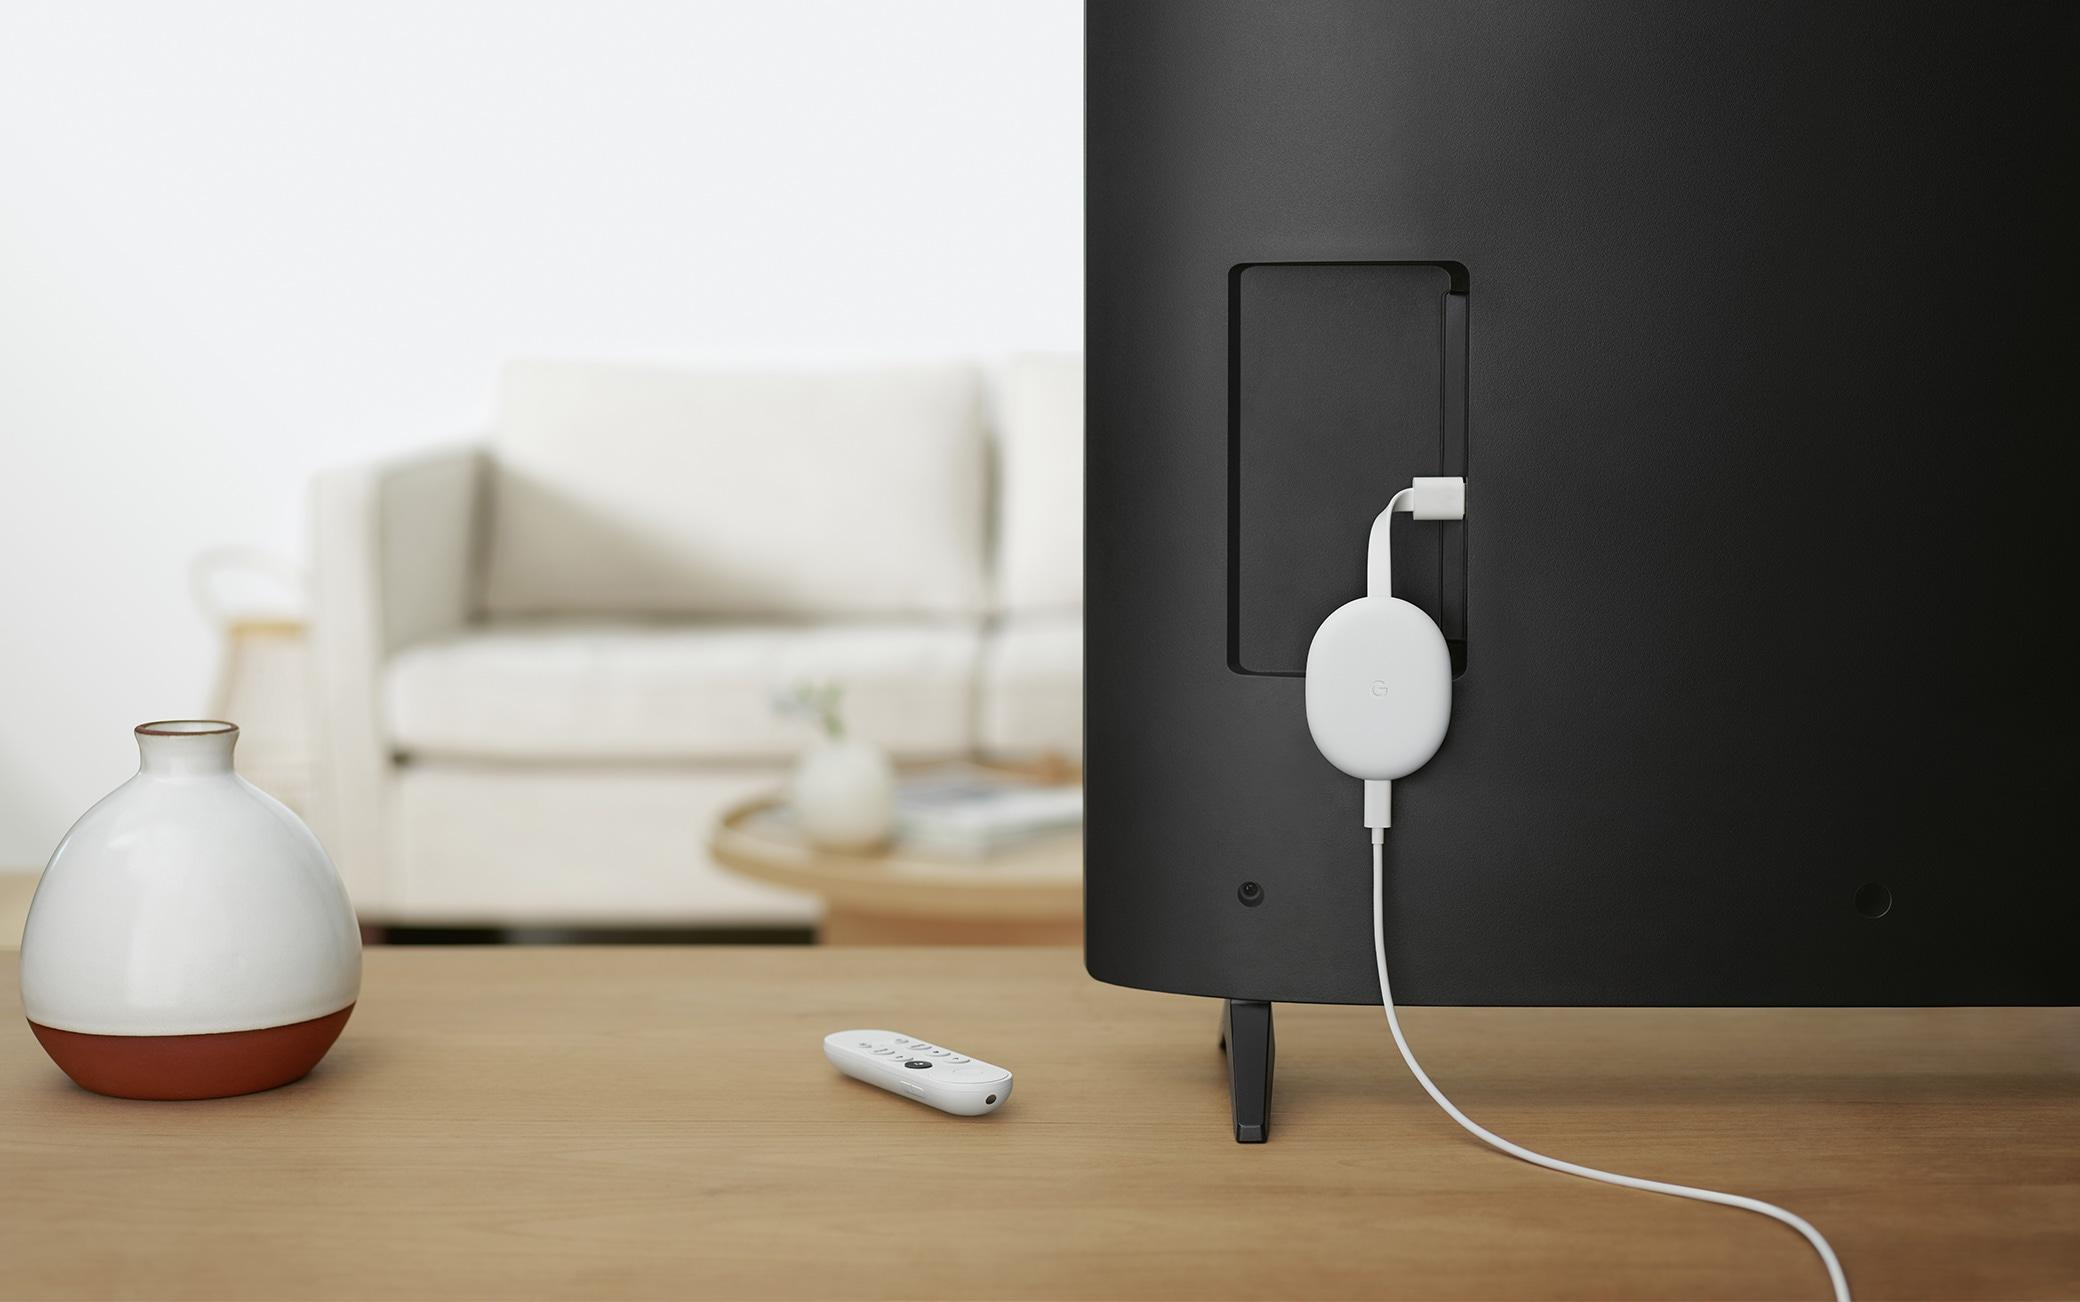 La nuova Chromecast con Google TV